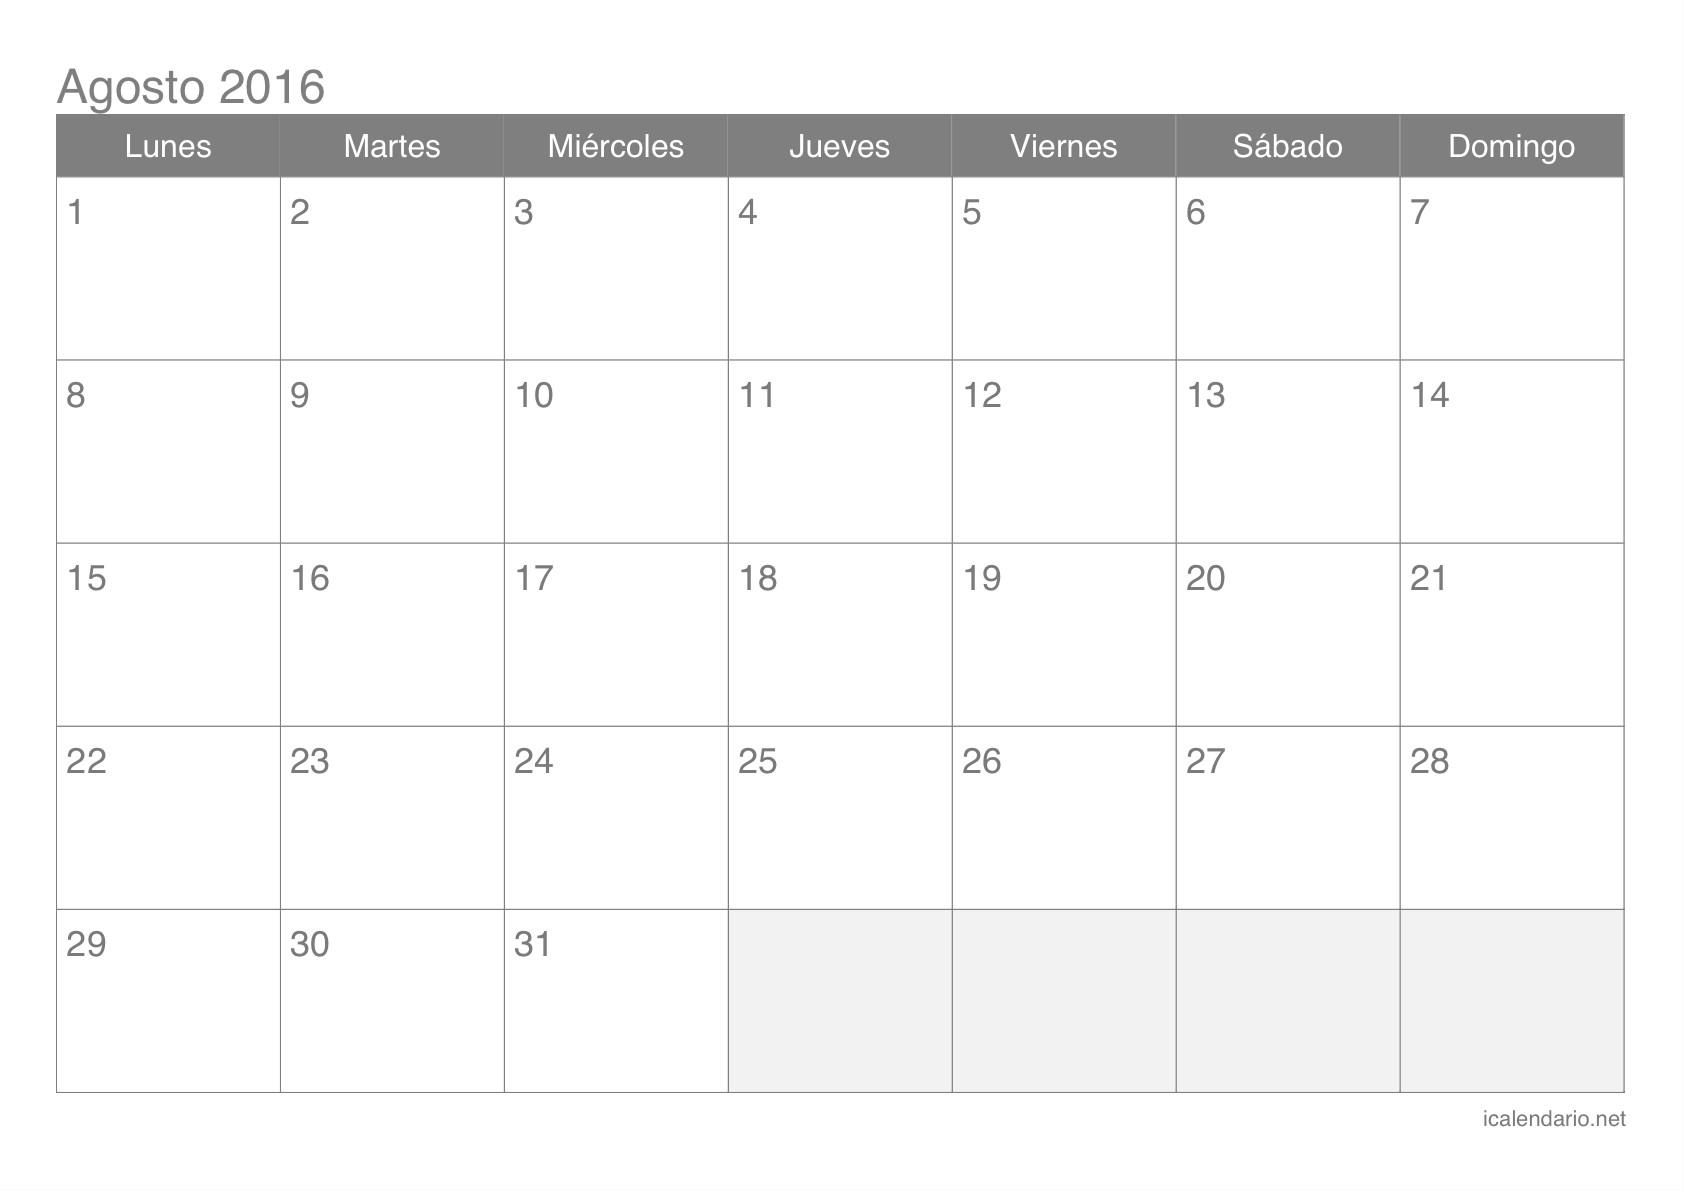 Calendario de agosto 2016 Calendario de agosto 2016